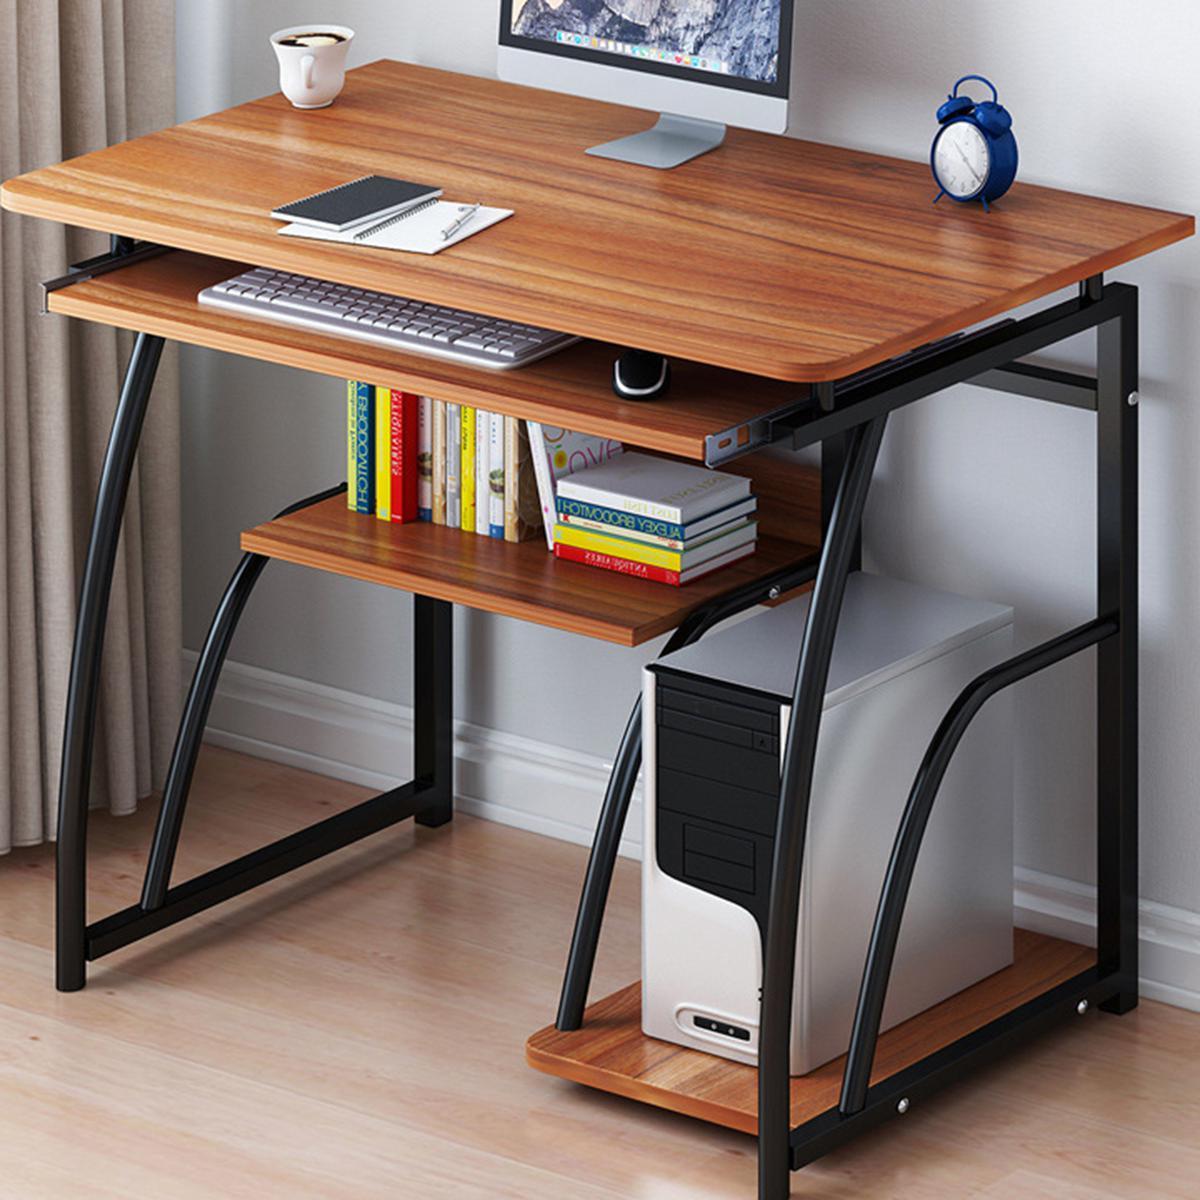 new computer desk study coffee table wooden laptop office home bookshelf diy